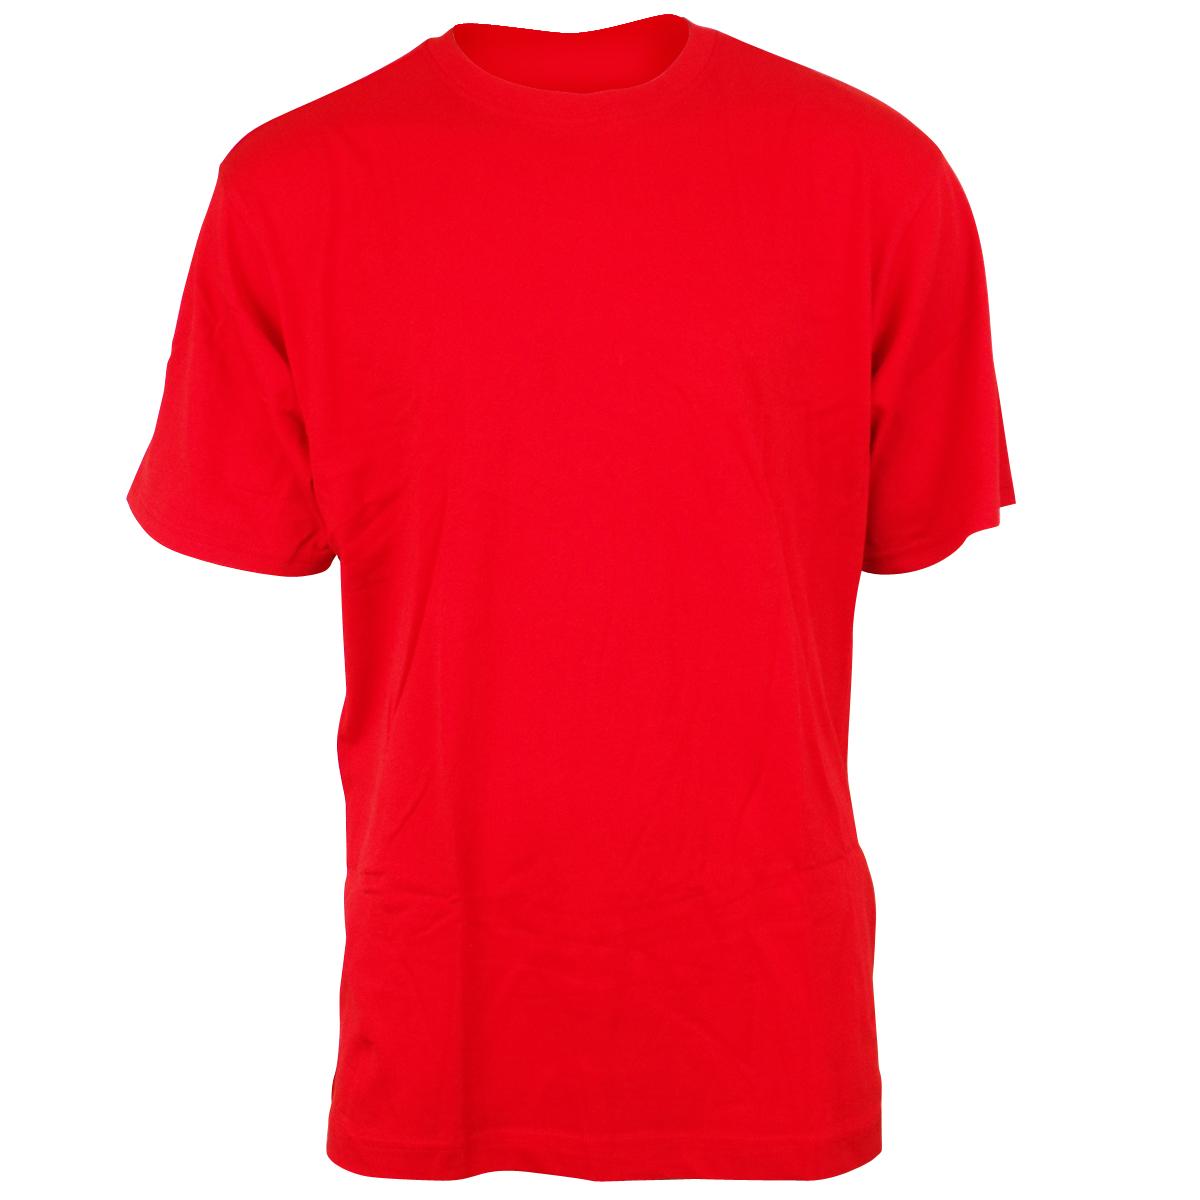 Mens Nike Retro Red Cotton Tee T Shirt Running Training Top L